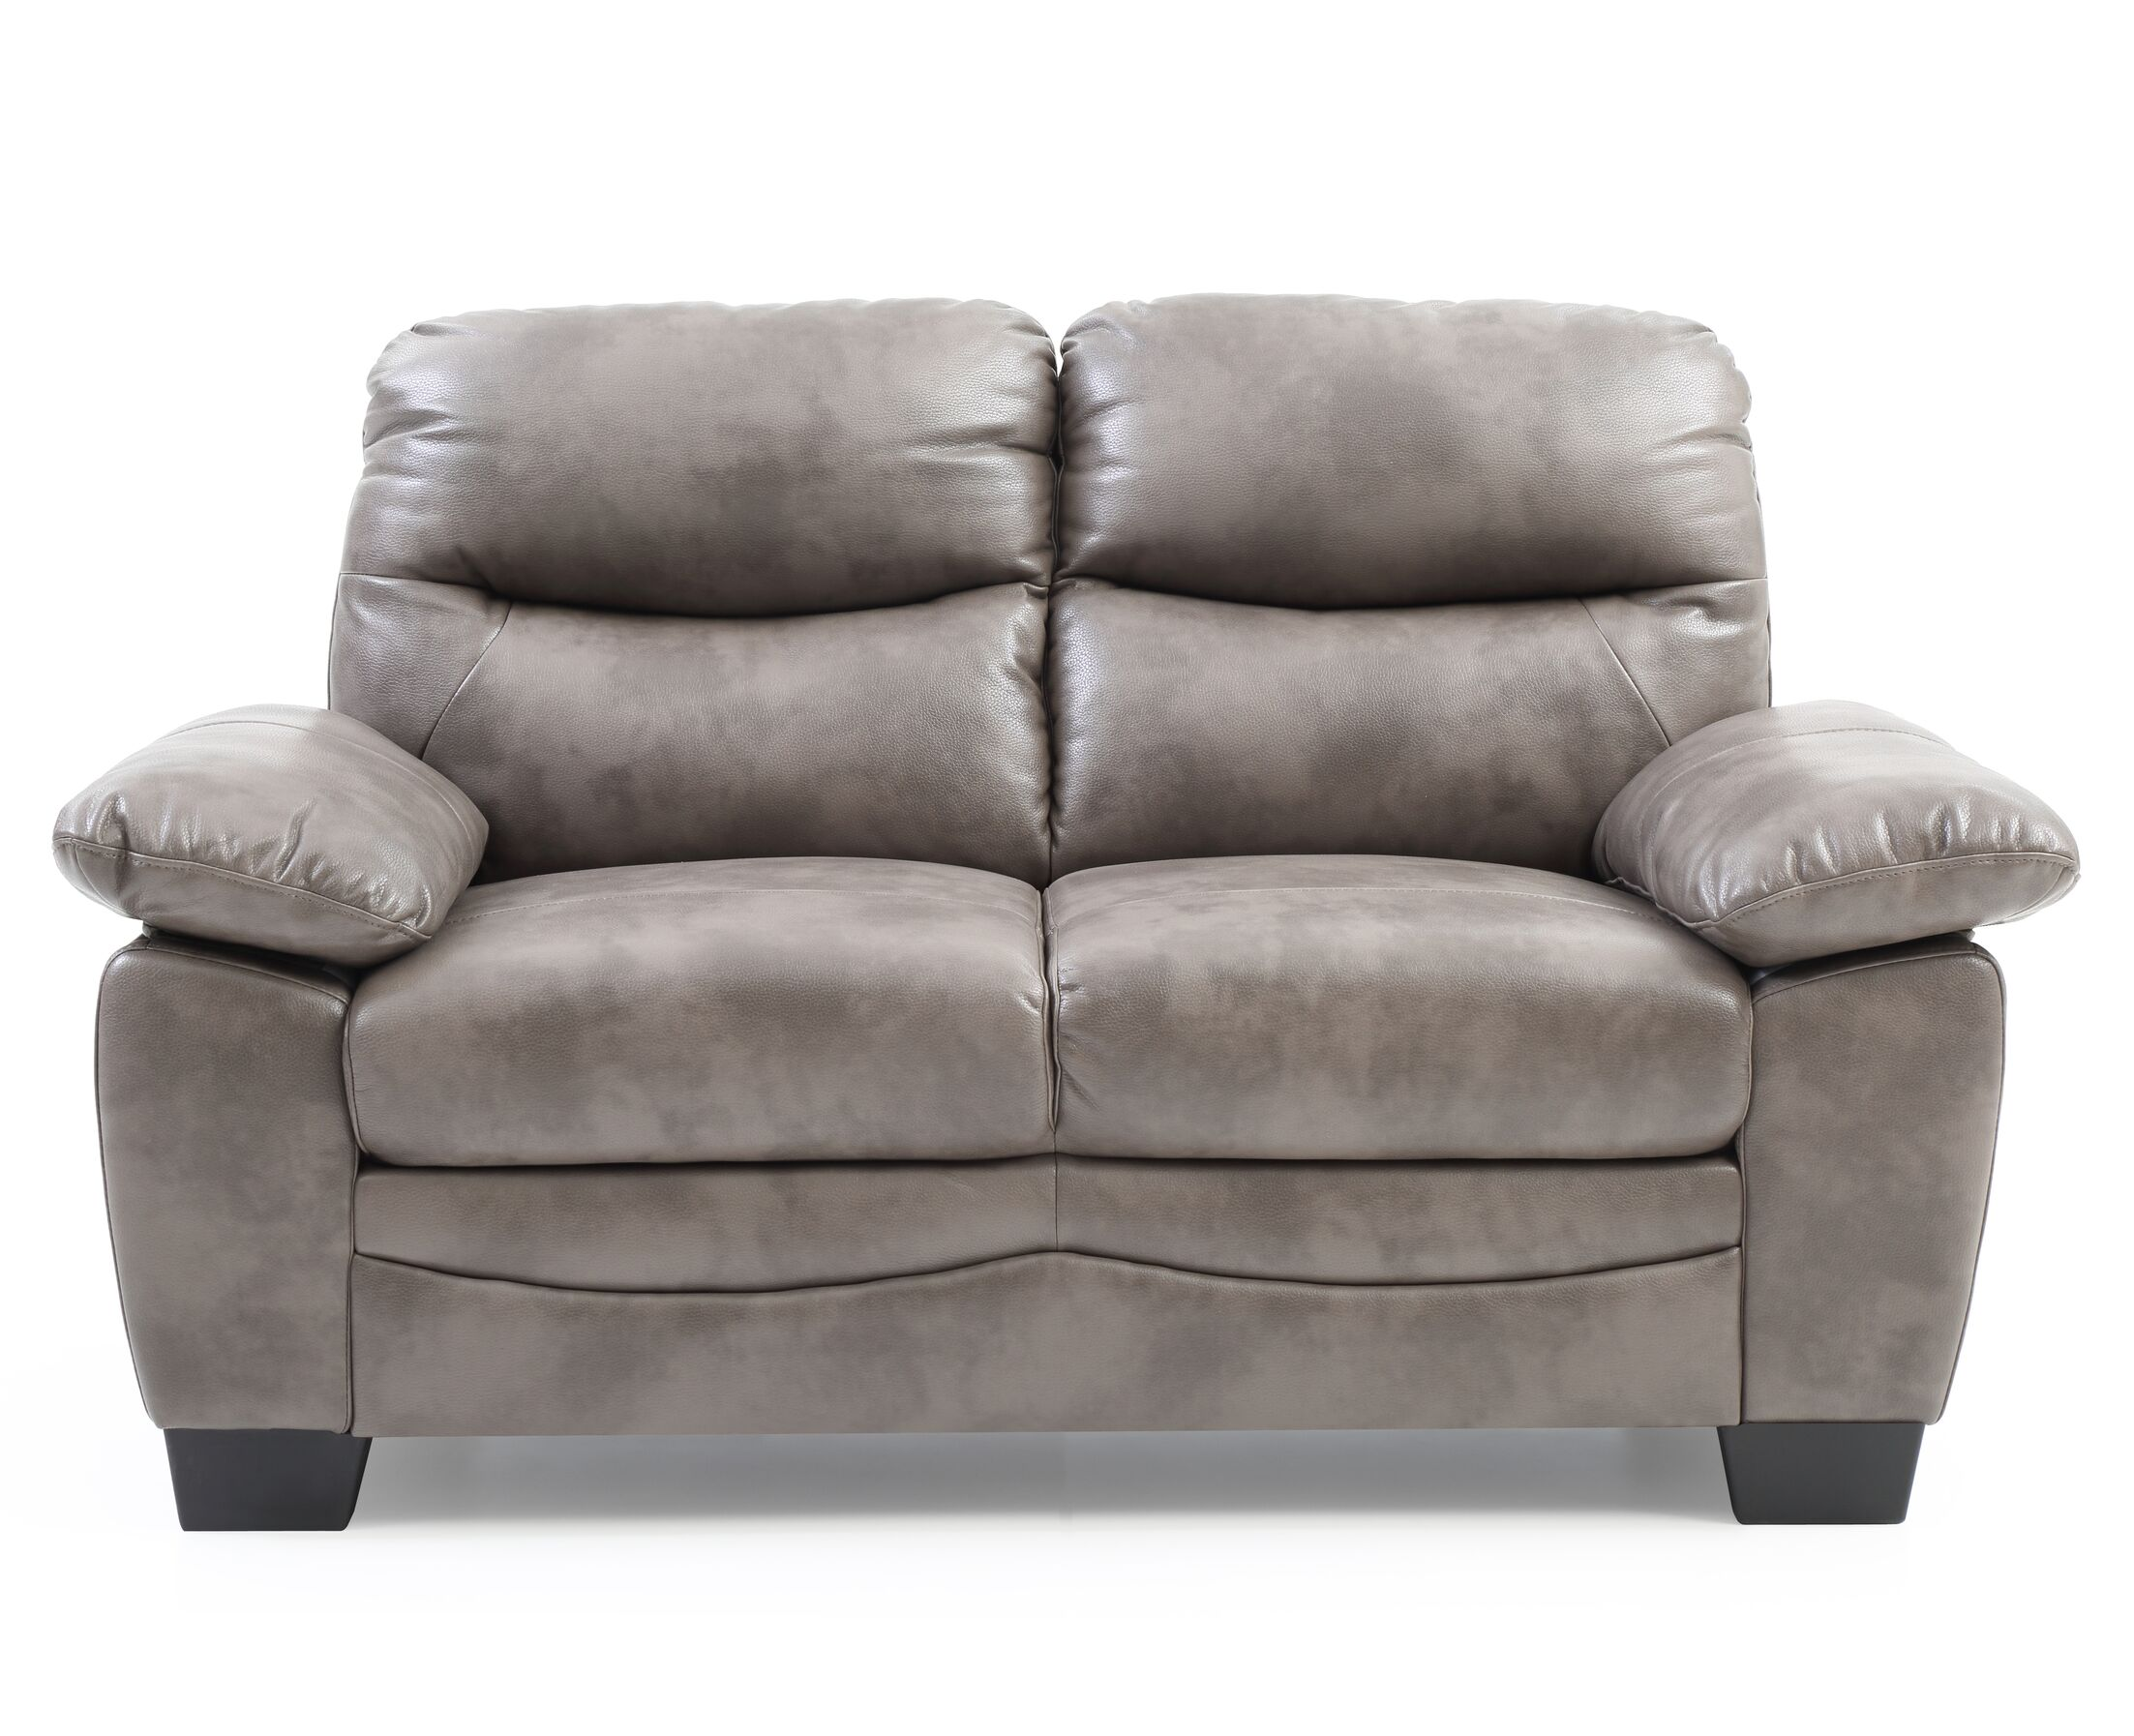 Mcnabb Loveseat Upholstery: Gray